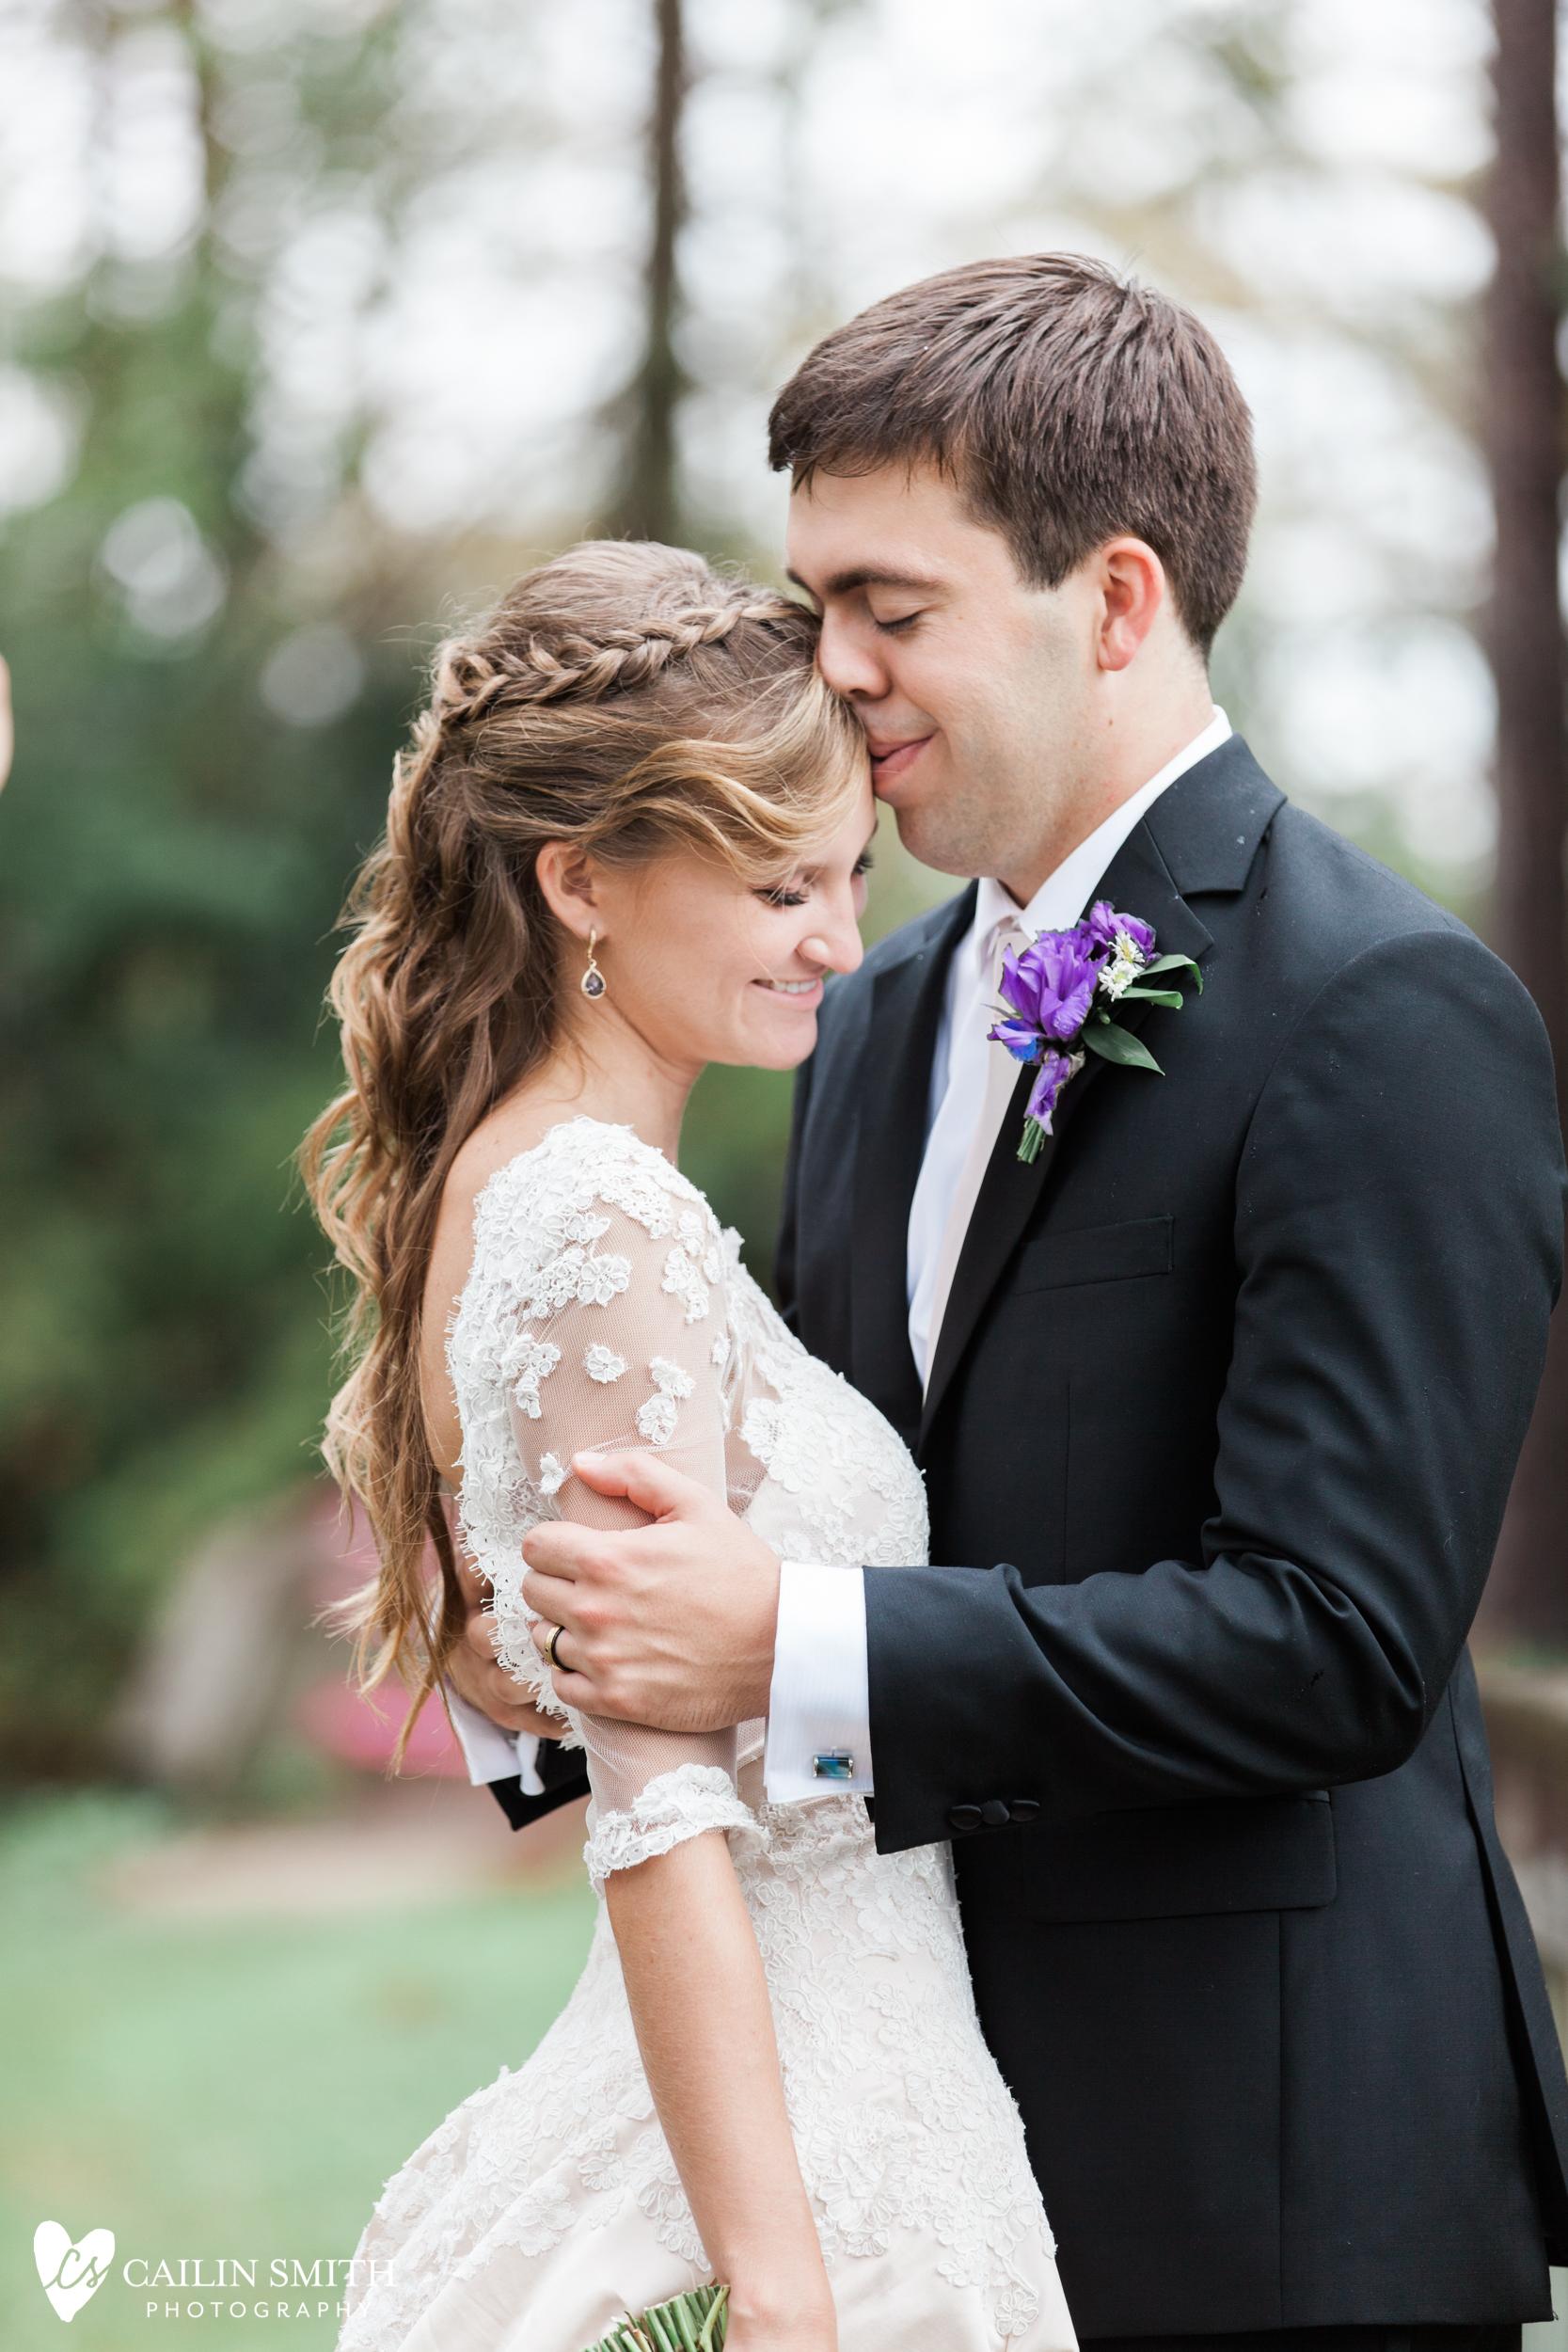 Shannon_David_Grace_Episcopal_Church_Wedding_photography_008.jpg